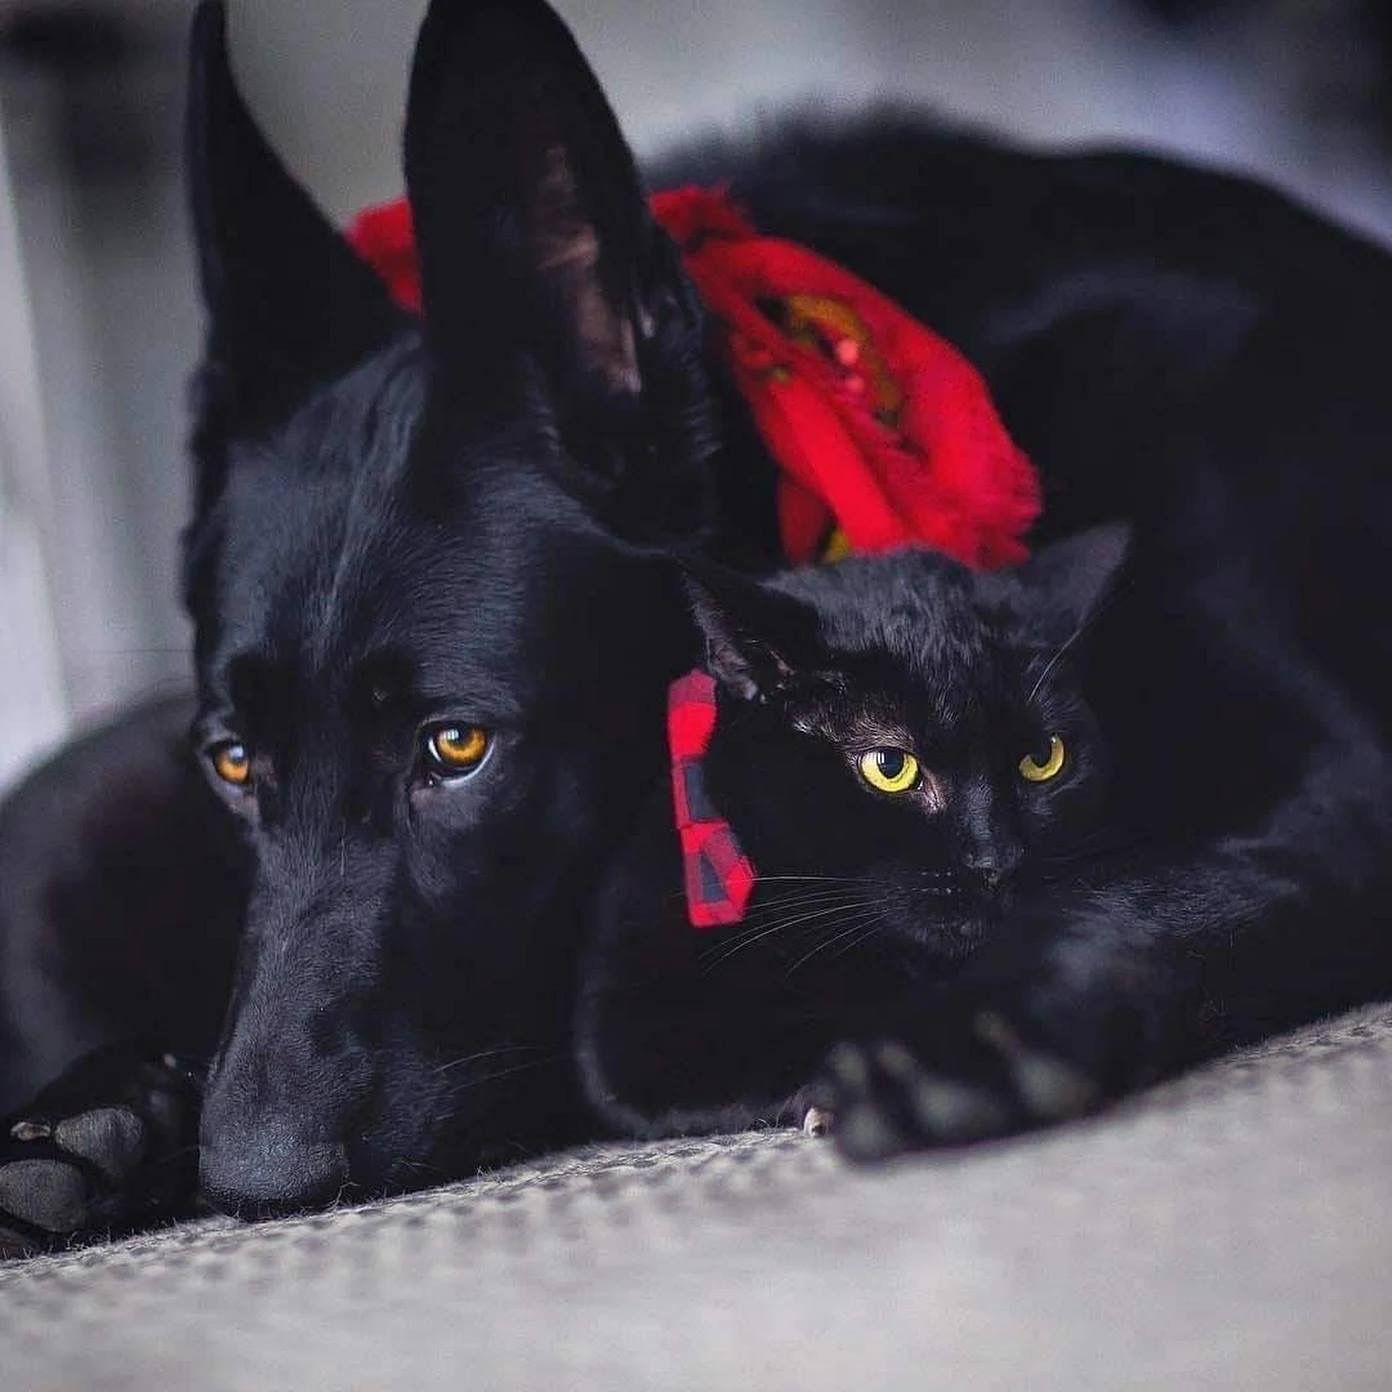 Hunderasse Ähnlich Pudel - Hunderasse Ähnlich Pudel